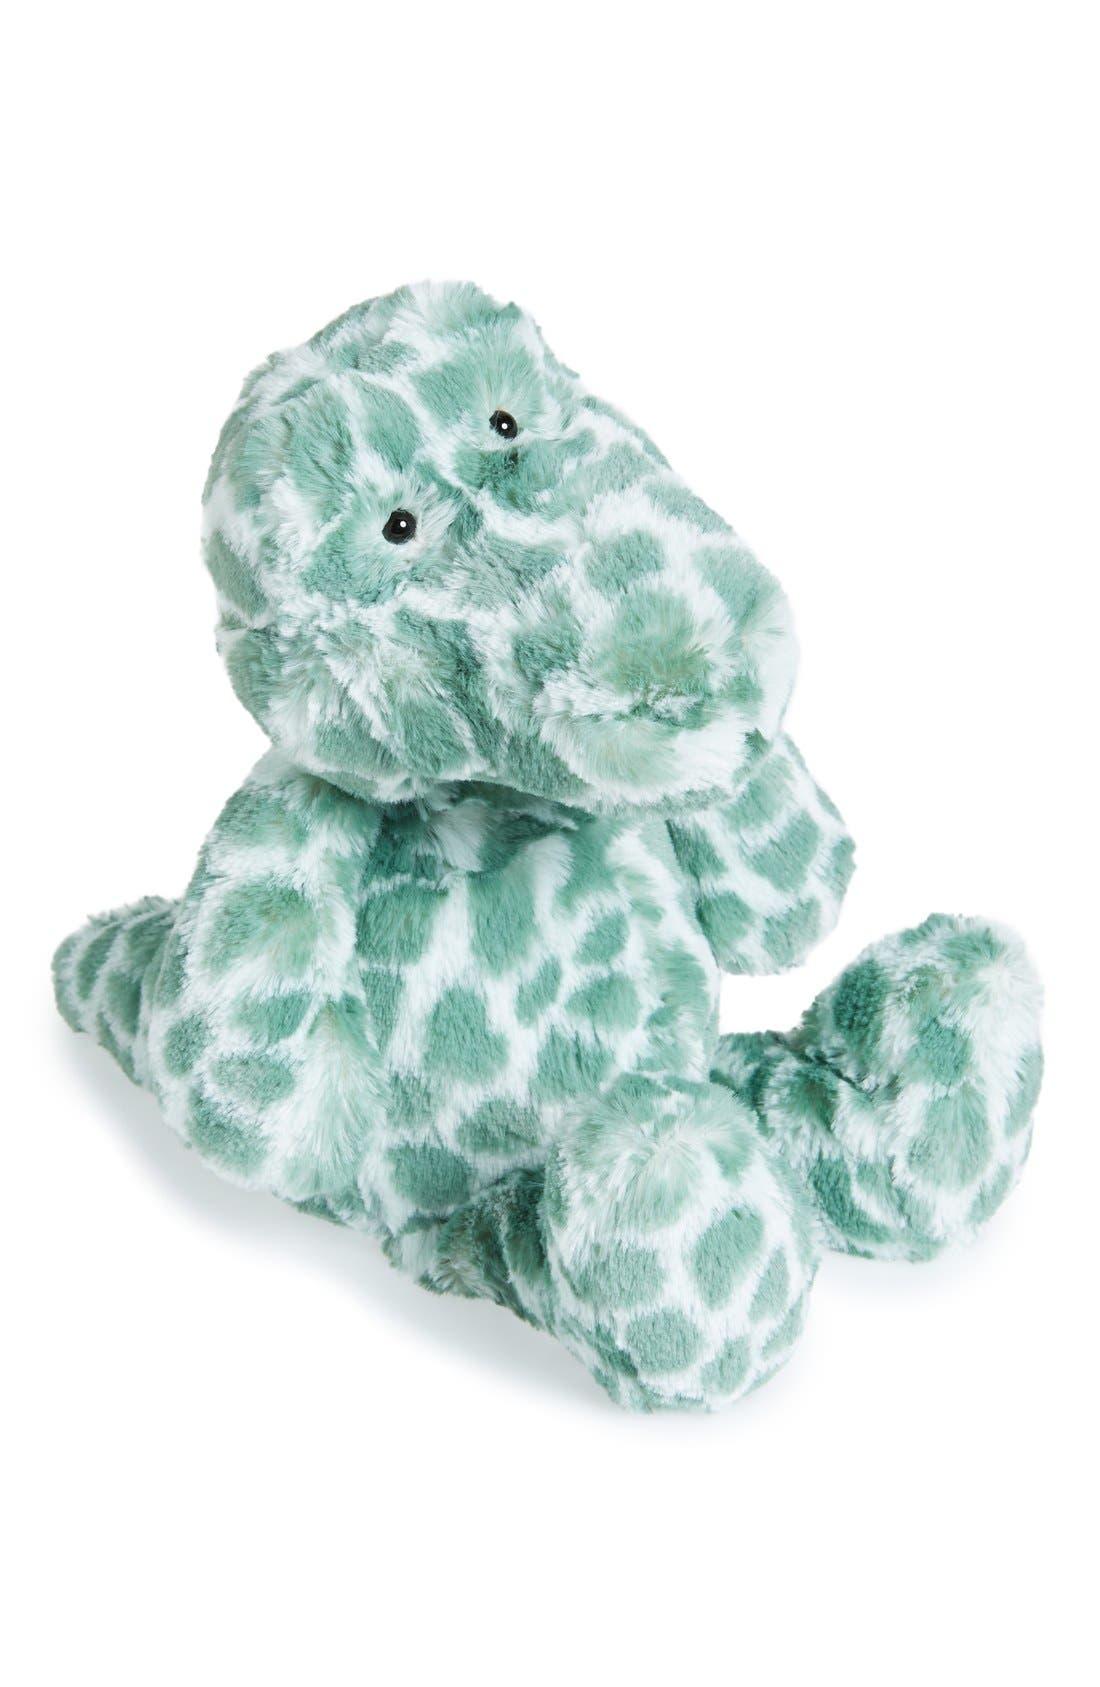 Jellycat 'Dapple Croc' Stuffed Animal